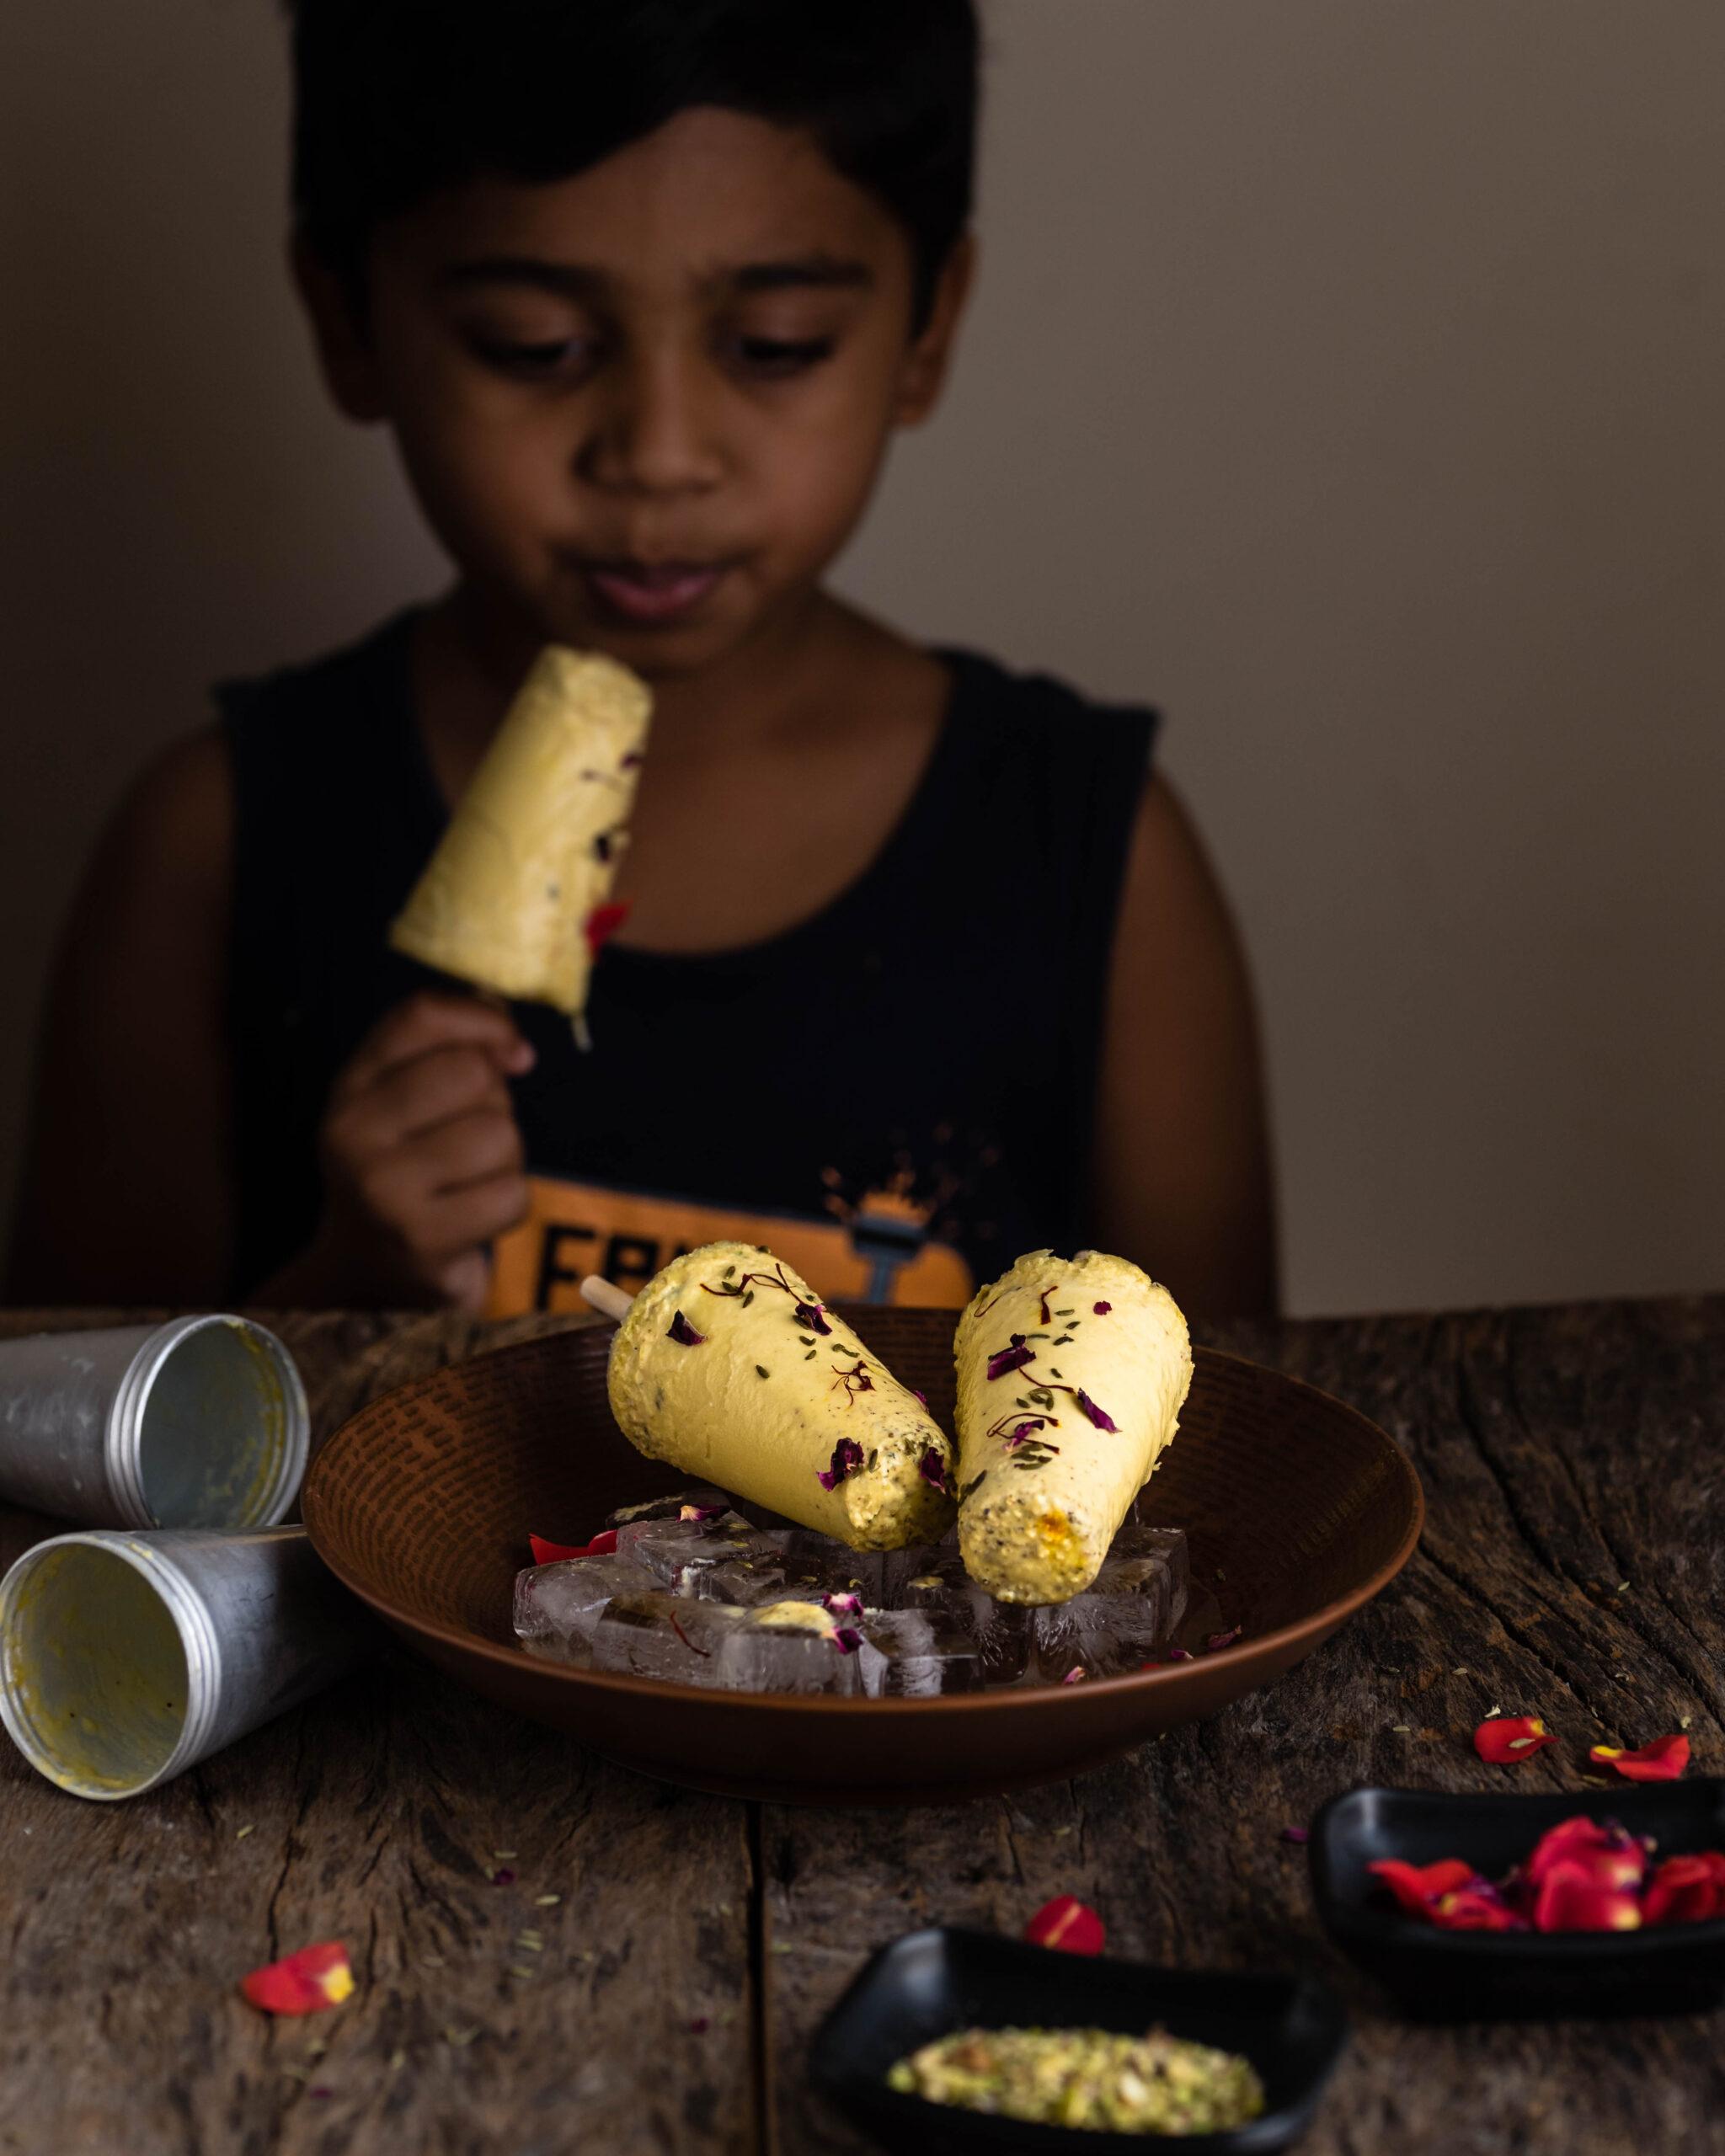 Thandai popsicle, holi popsicle, thandai, popsicle, popsicle recipe, thandai recipe, easy thandai recipe, easy popsicle recipe